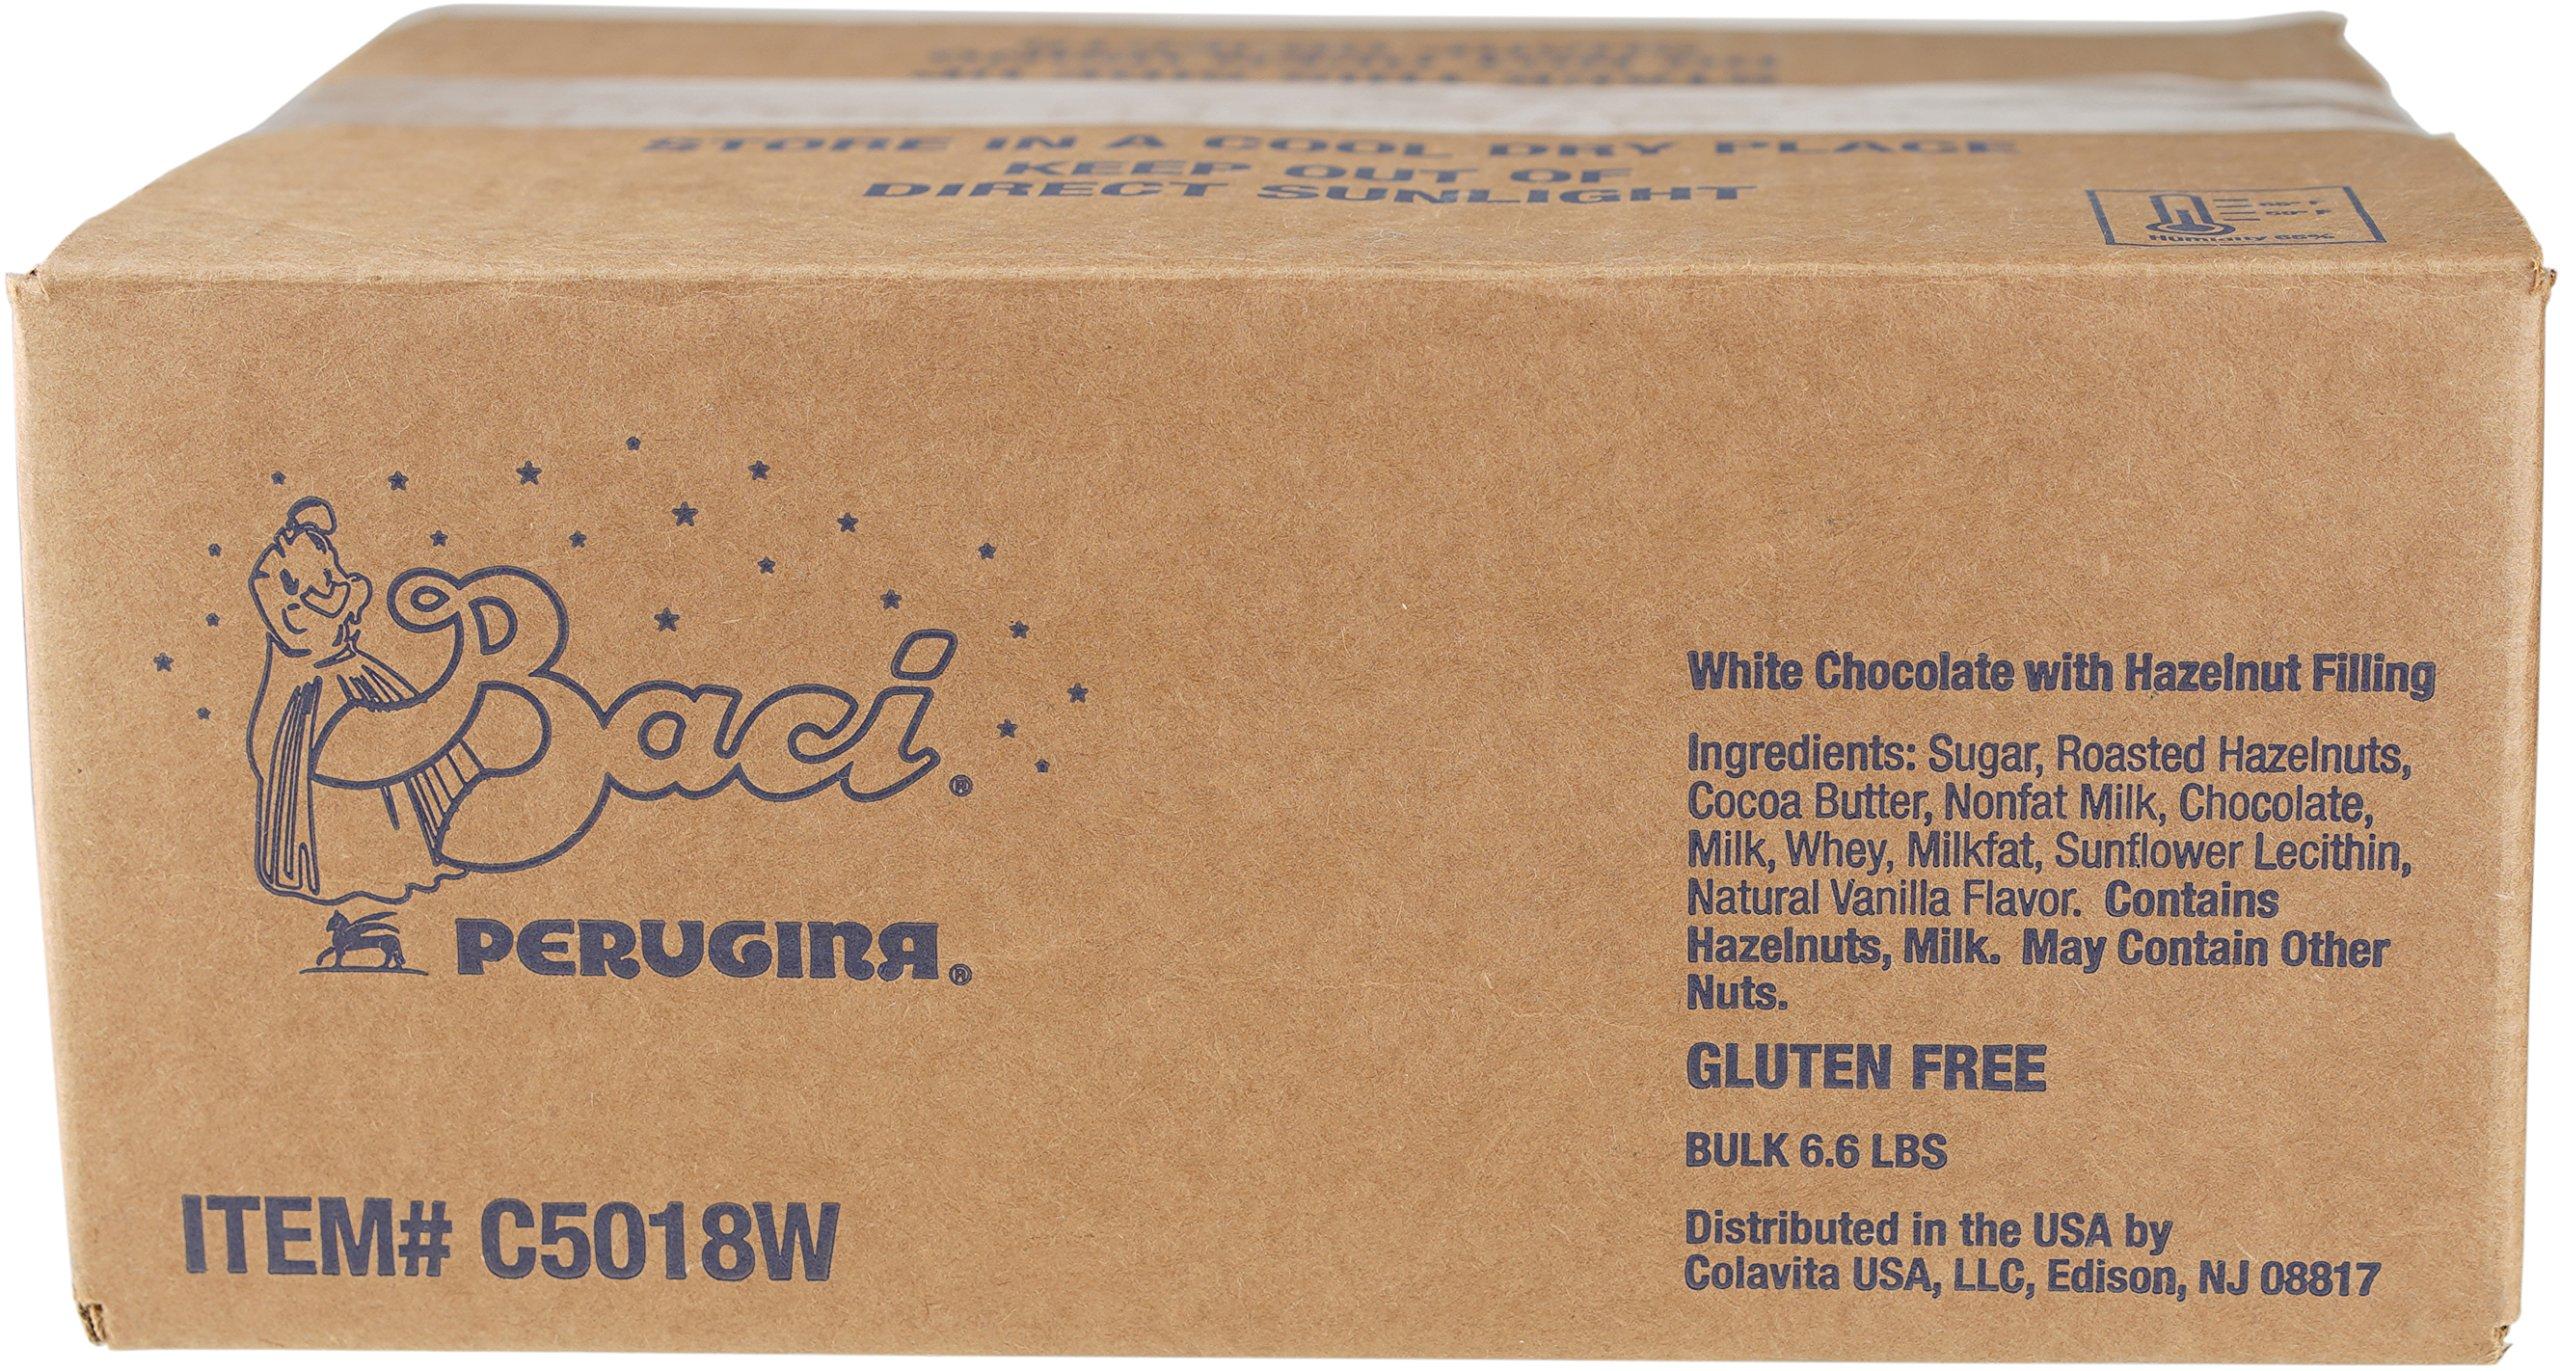 Perugina Baci Chocolate Bulk Box, White, 6.6 Pound by Perugina (Image #7)